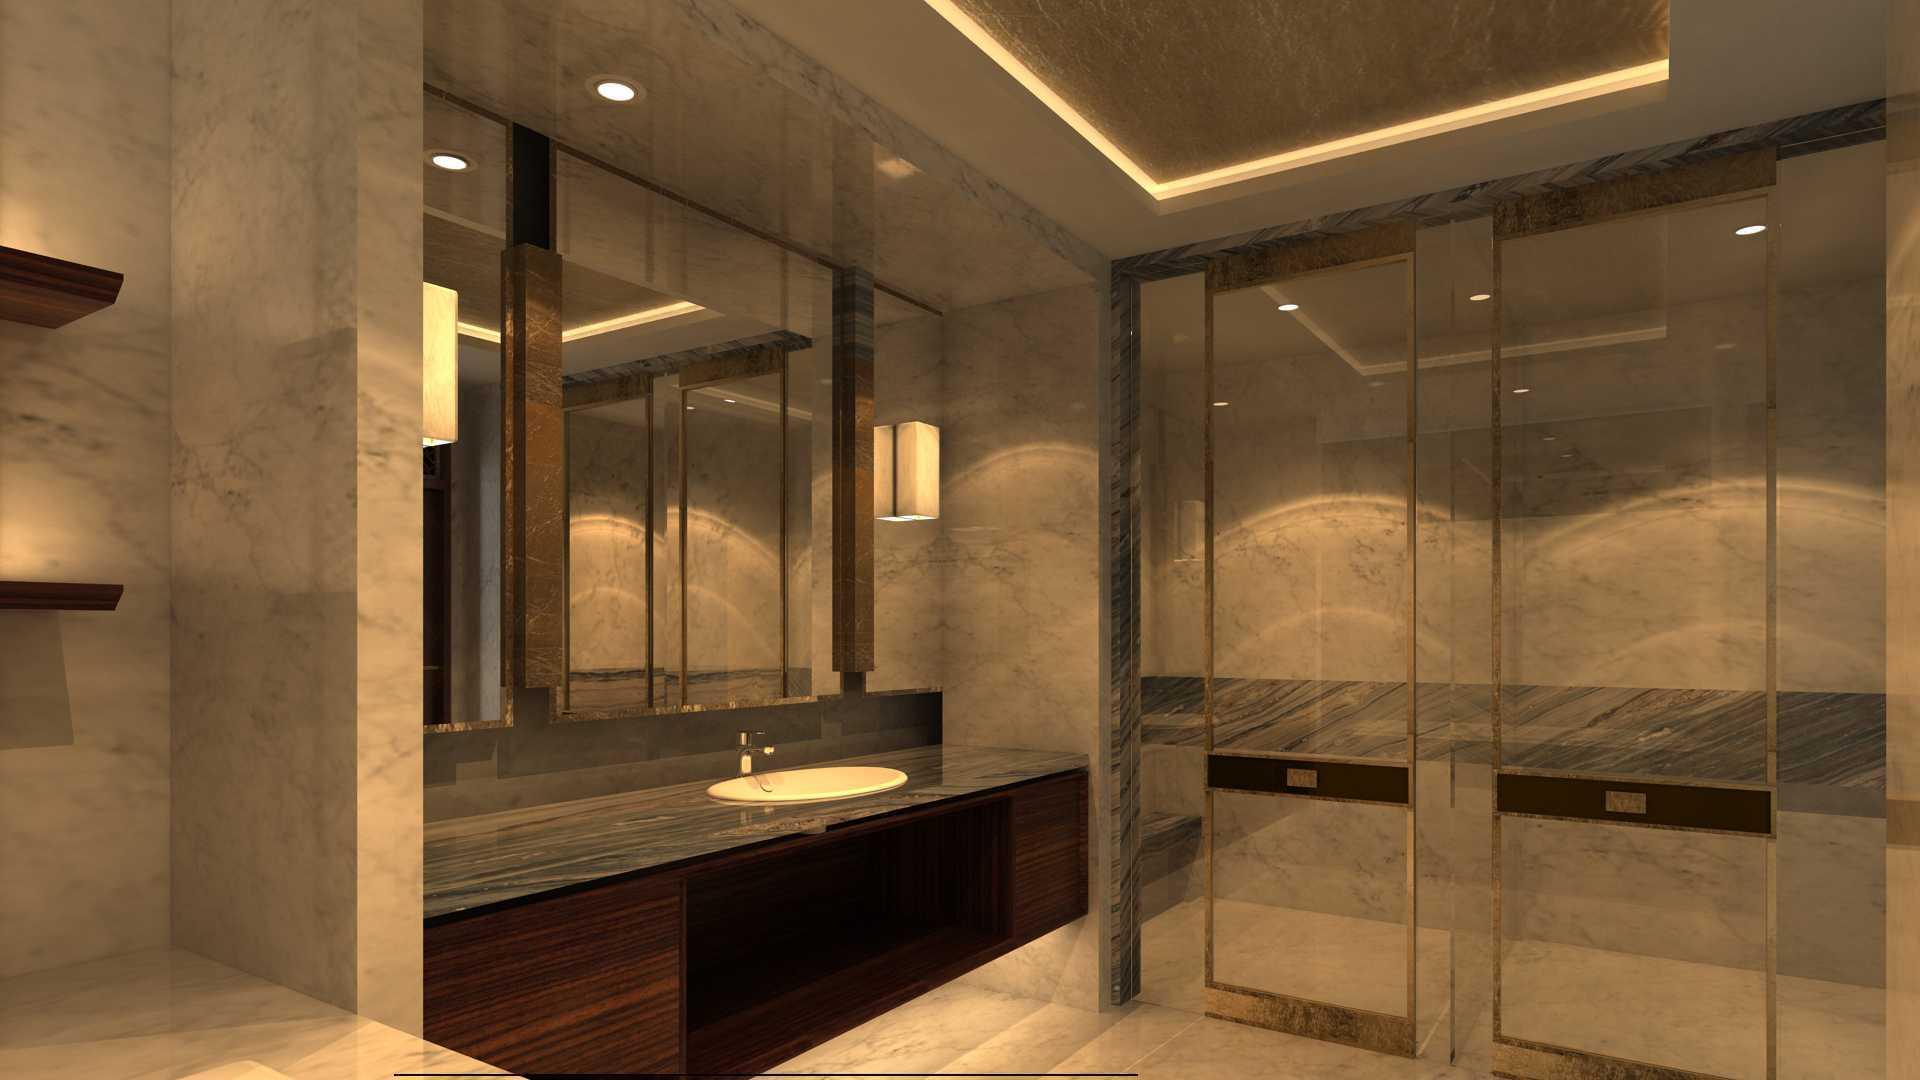 Vin•da•te Mayang Permai Residence Ii - Residential Project (Artist Impression - Construction In Progress) Pantai Indah Kapuk - North Jakarta Pantai Indah Kapuk - North Jakarta Lt Kontemporer  17224